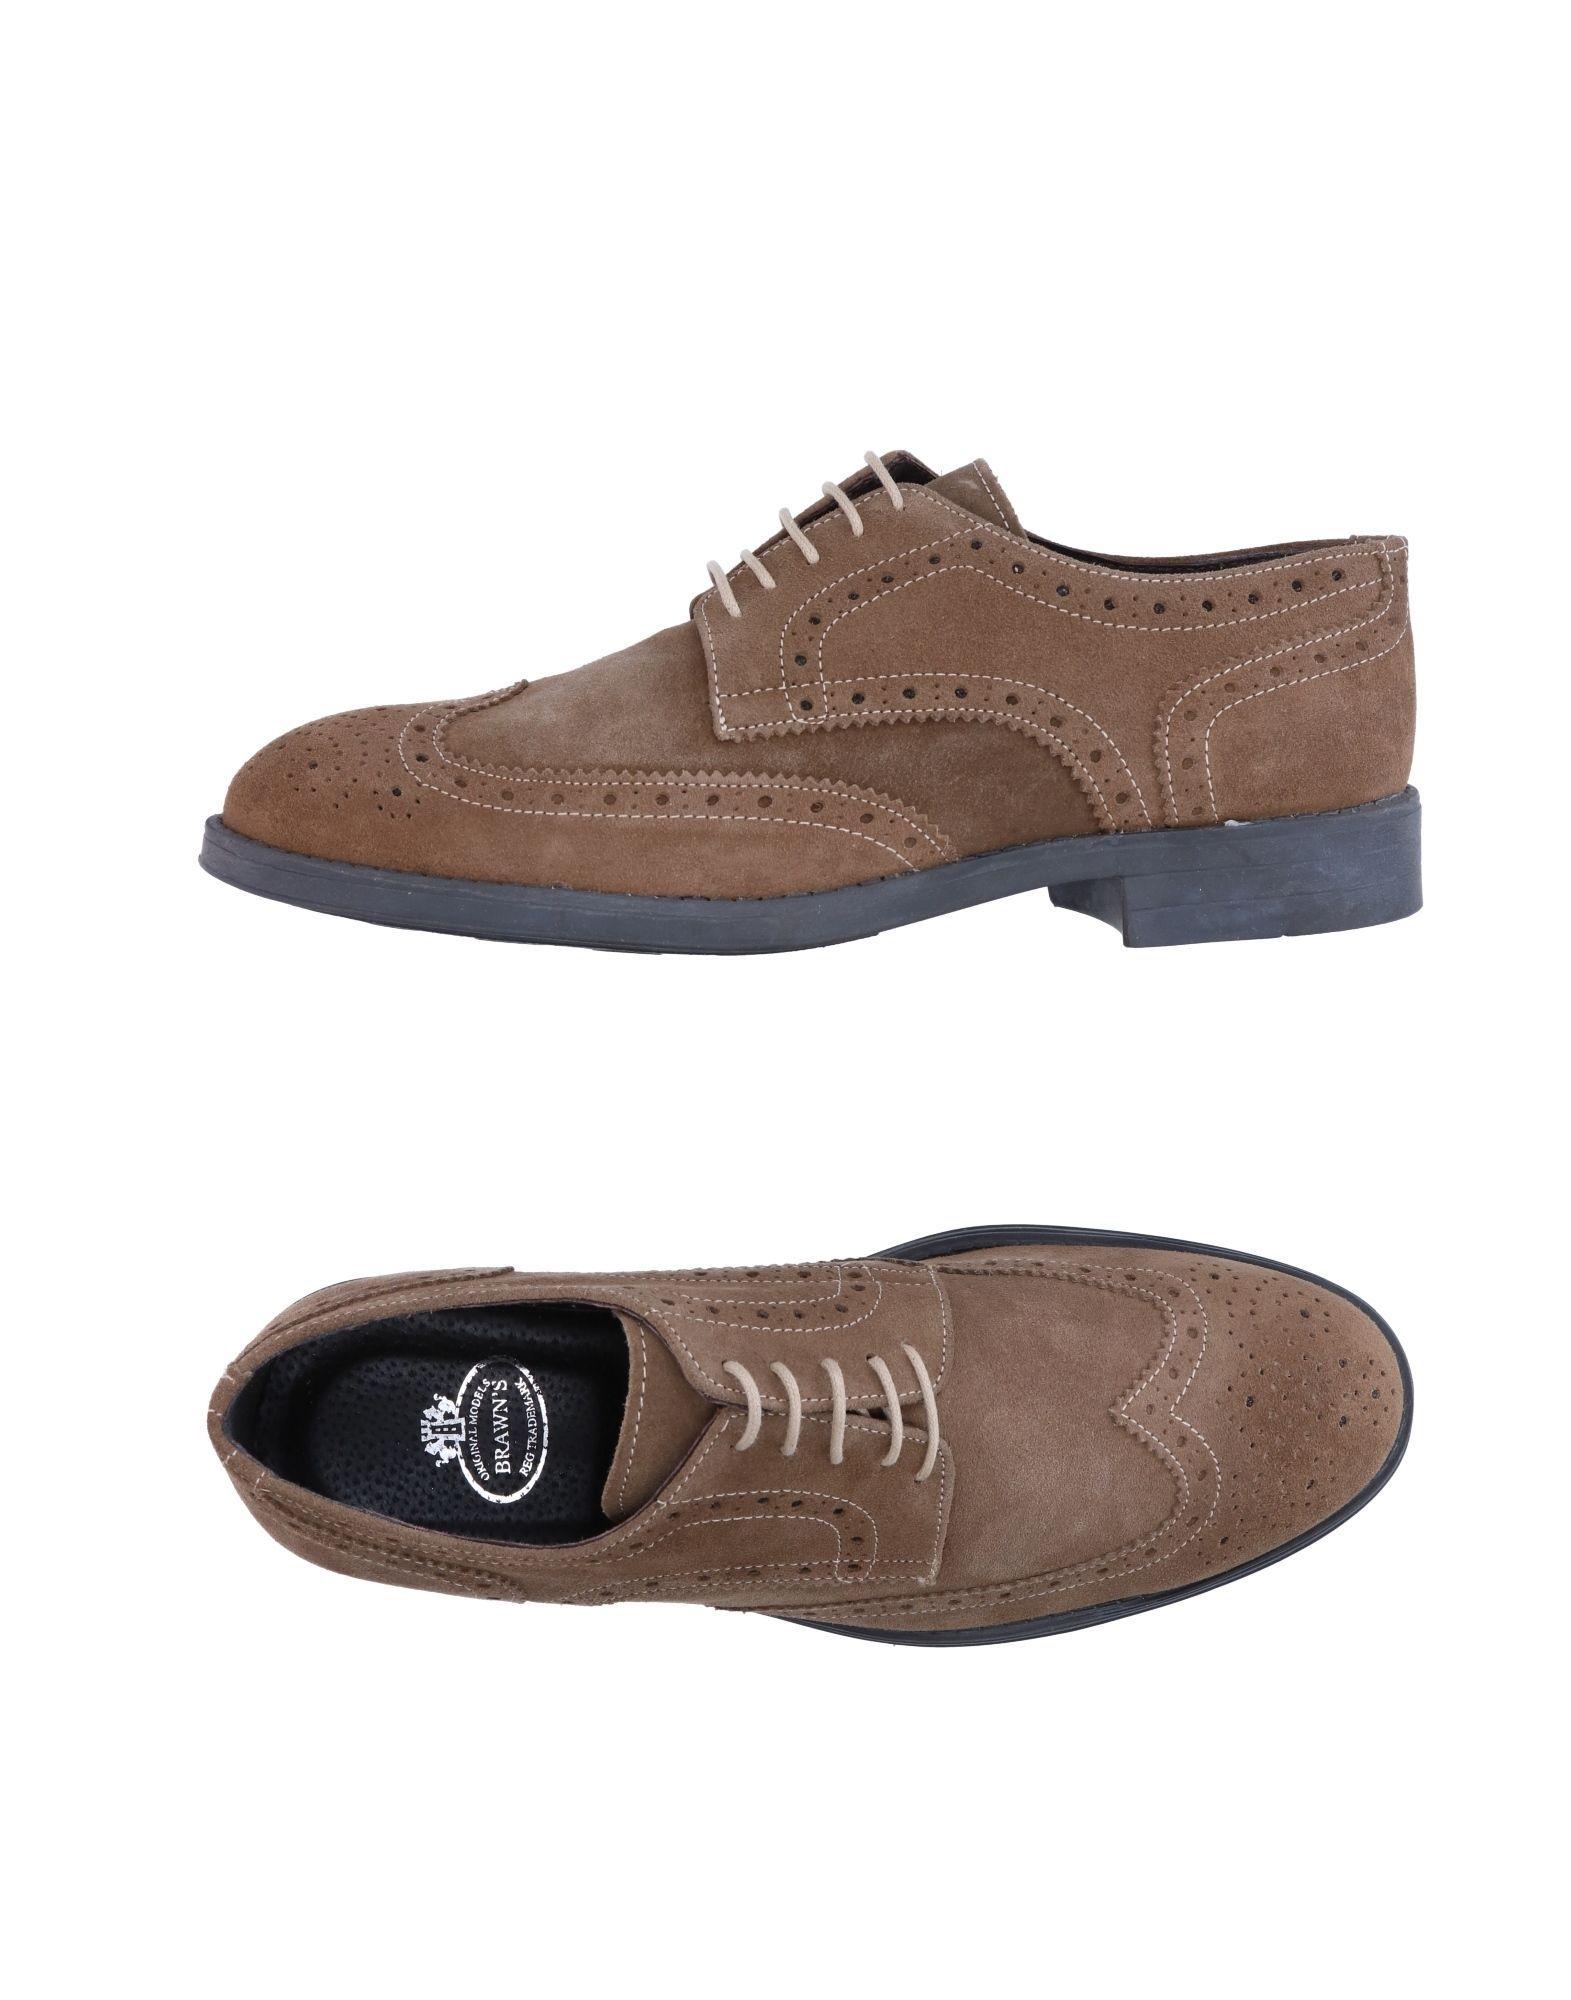 Brawn's Khaki Leather Lace Up Shoes